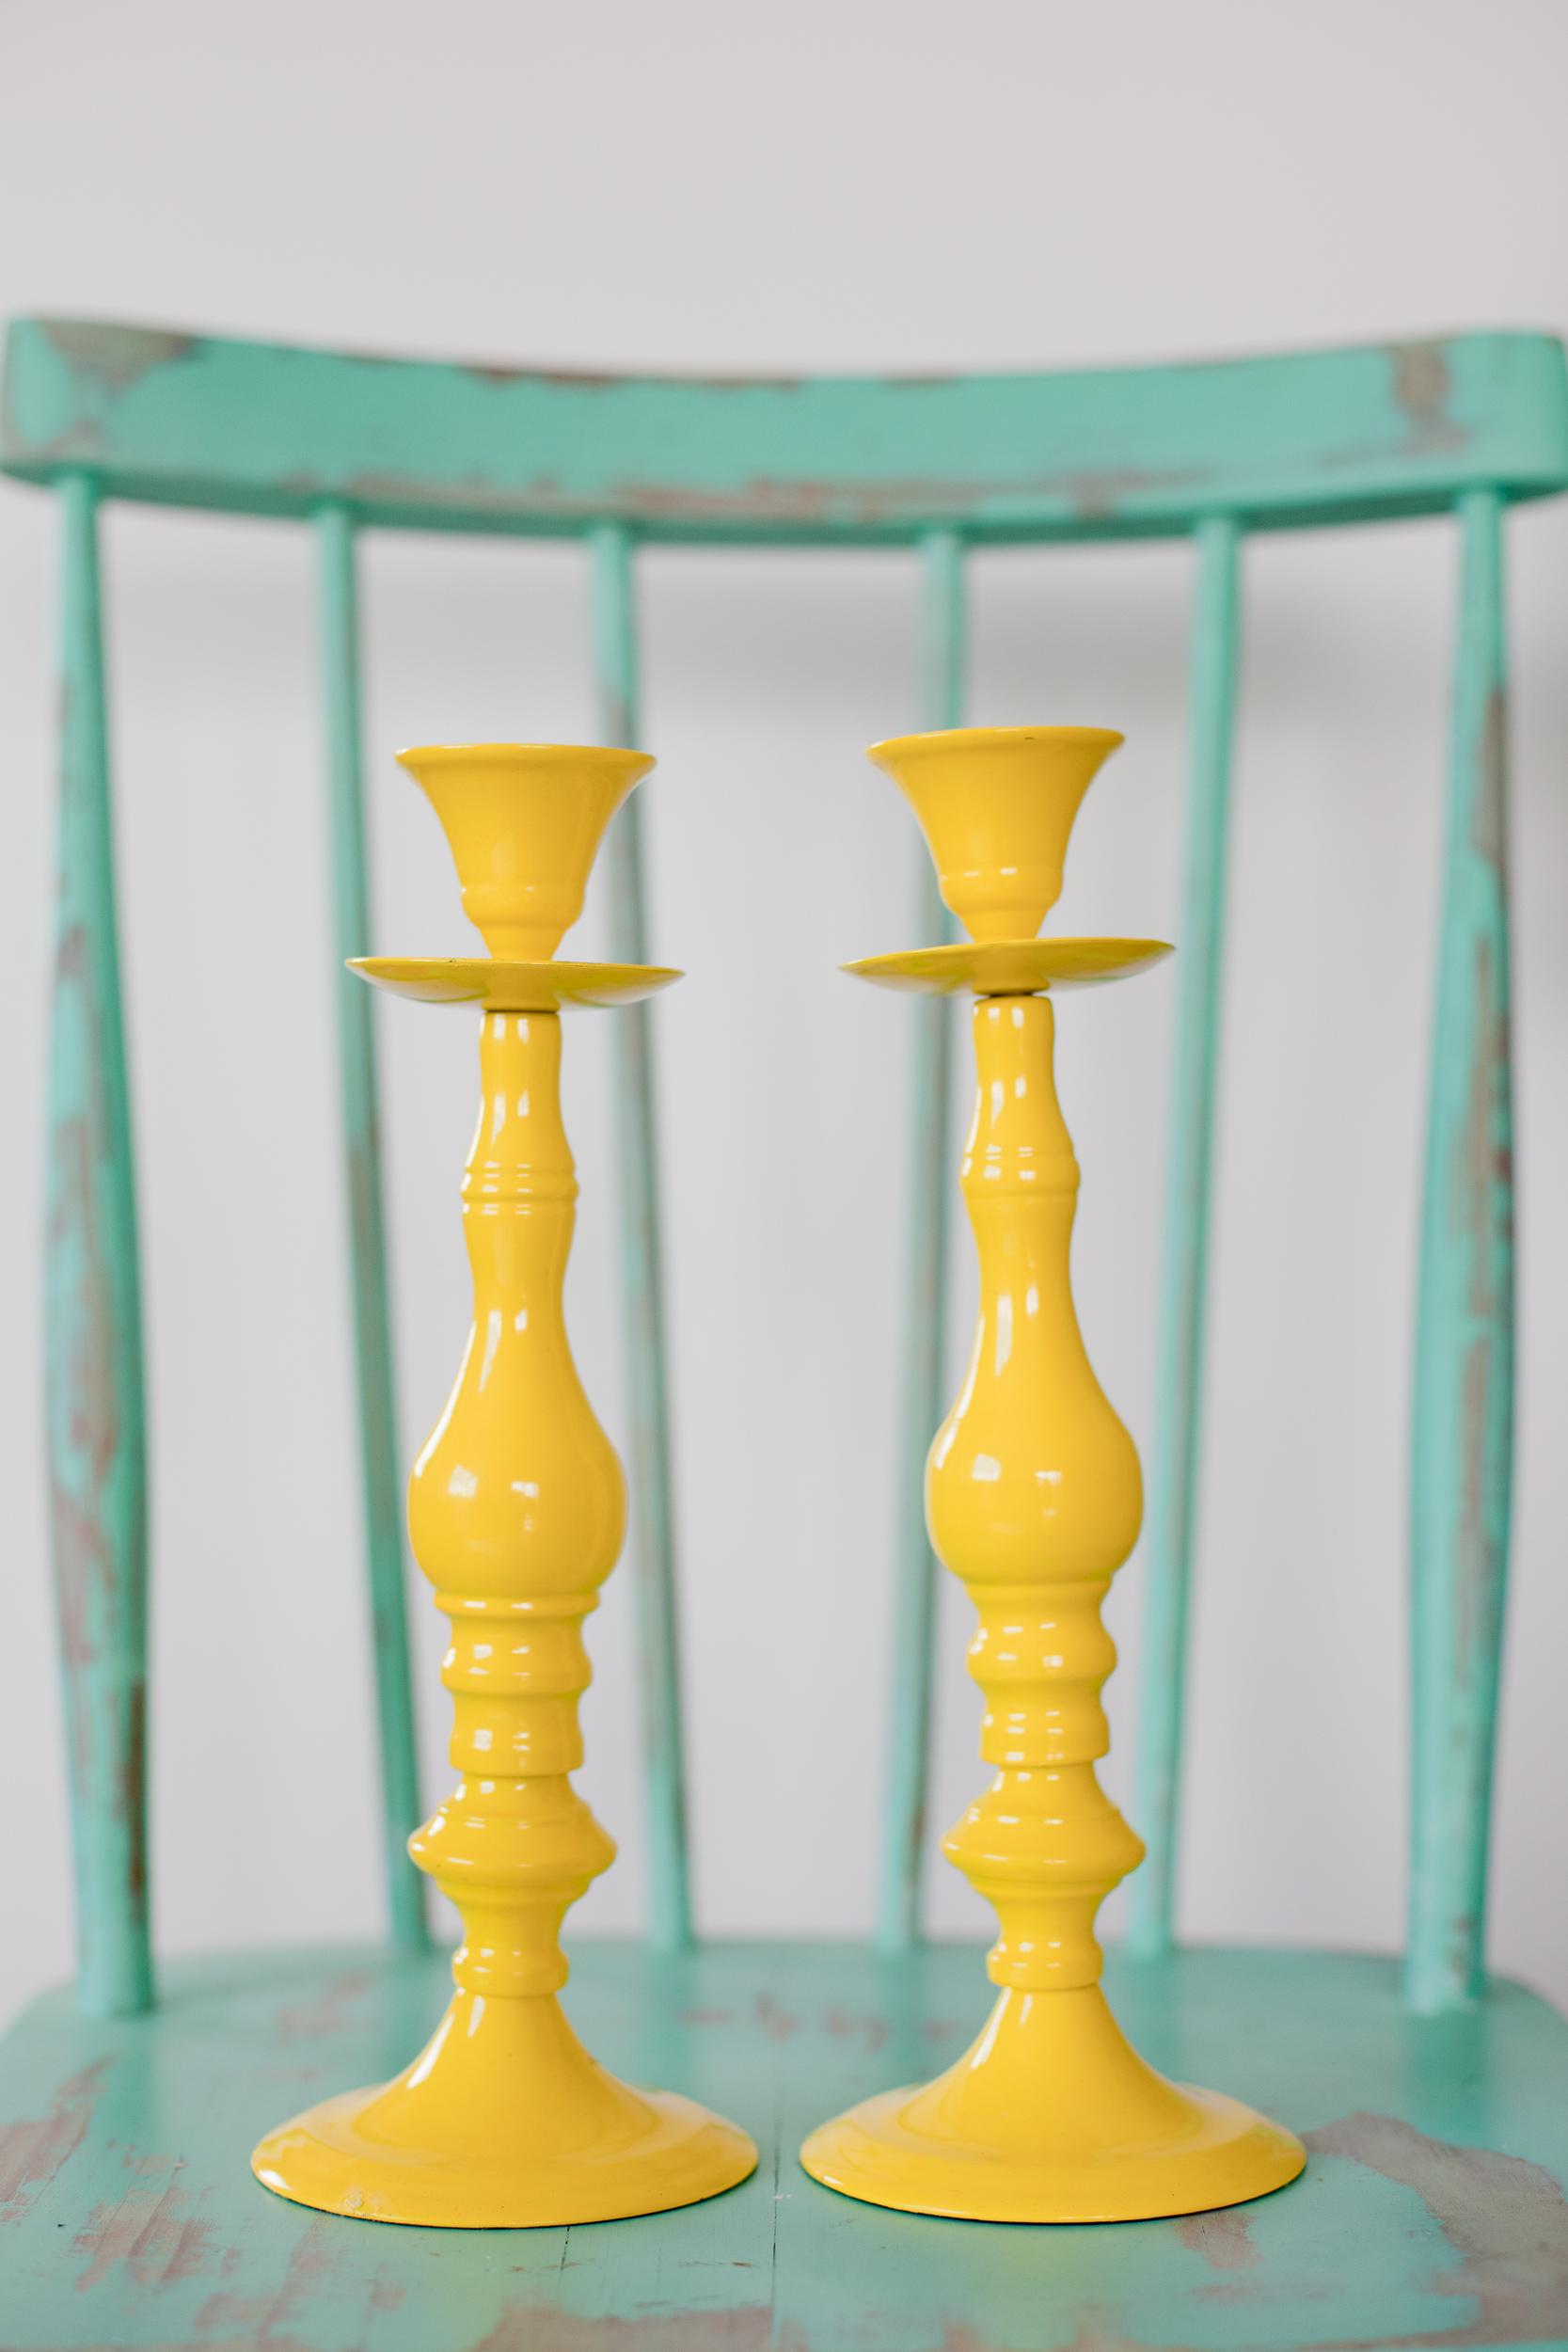 Yellow Metal Candle Sticks